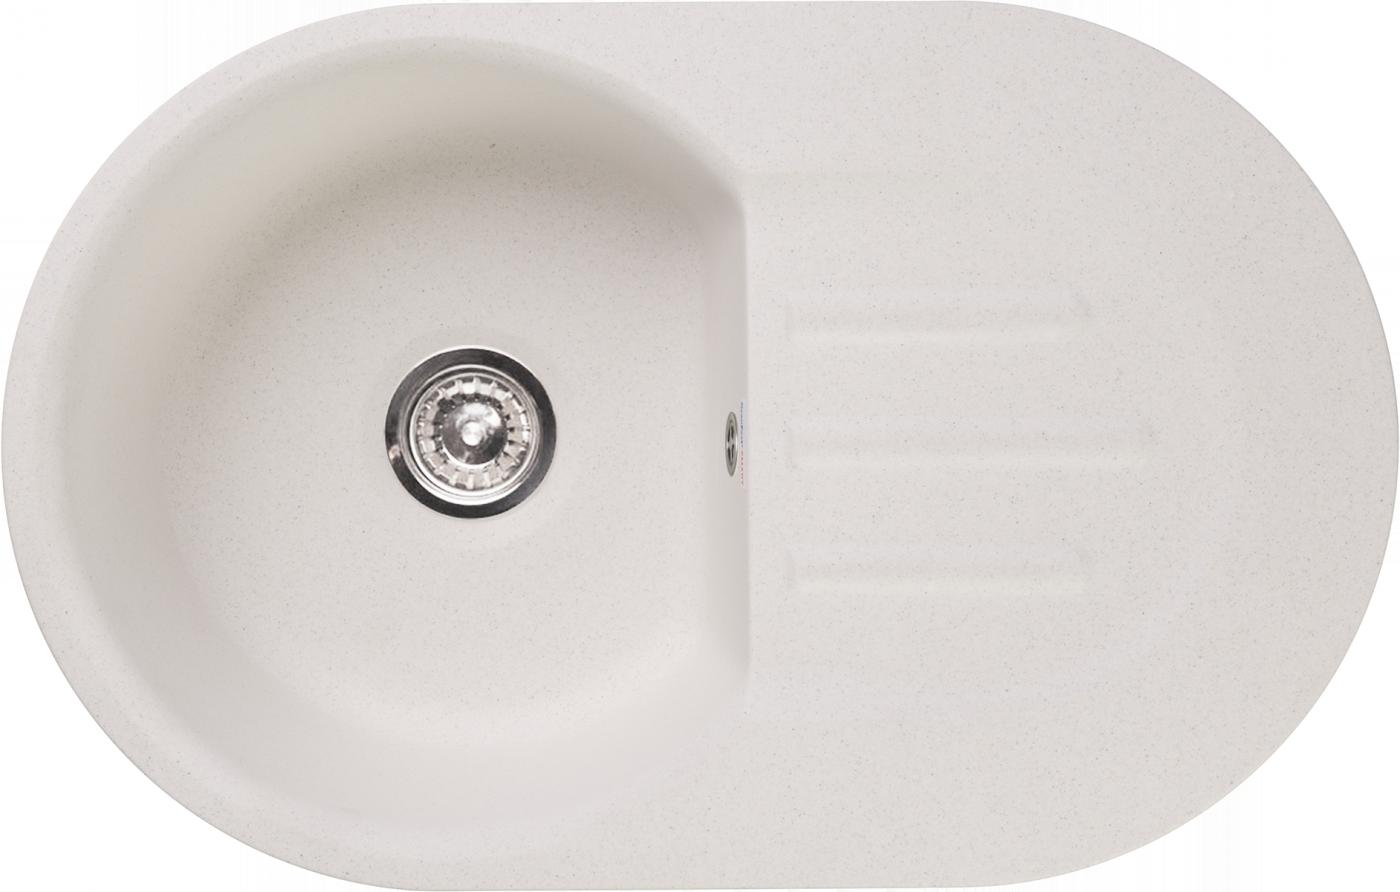 Мраморная мойка для кухни GranFest Smart SM685L Белый